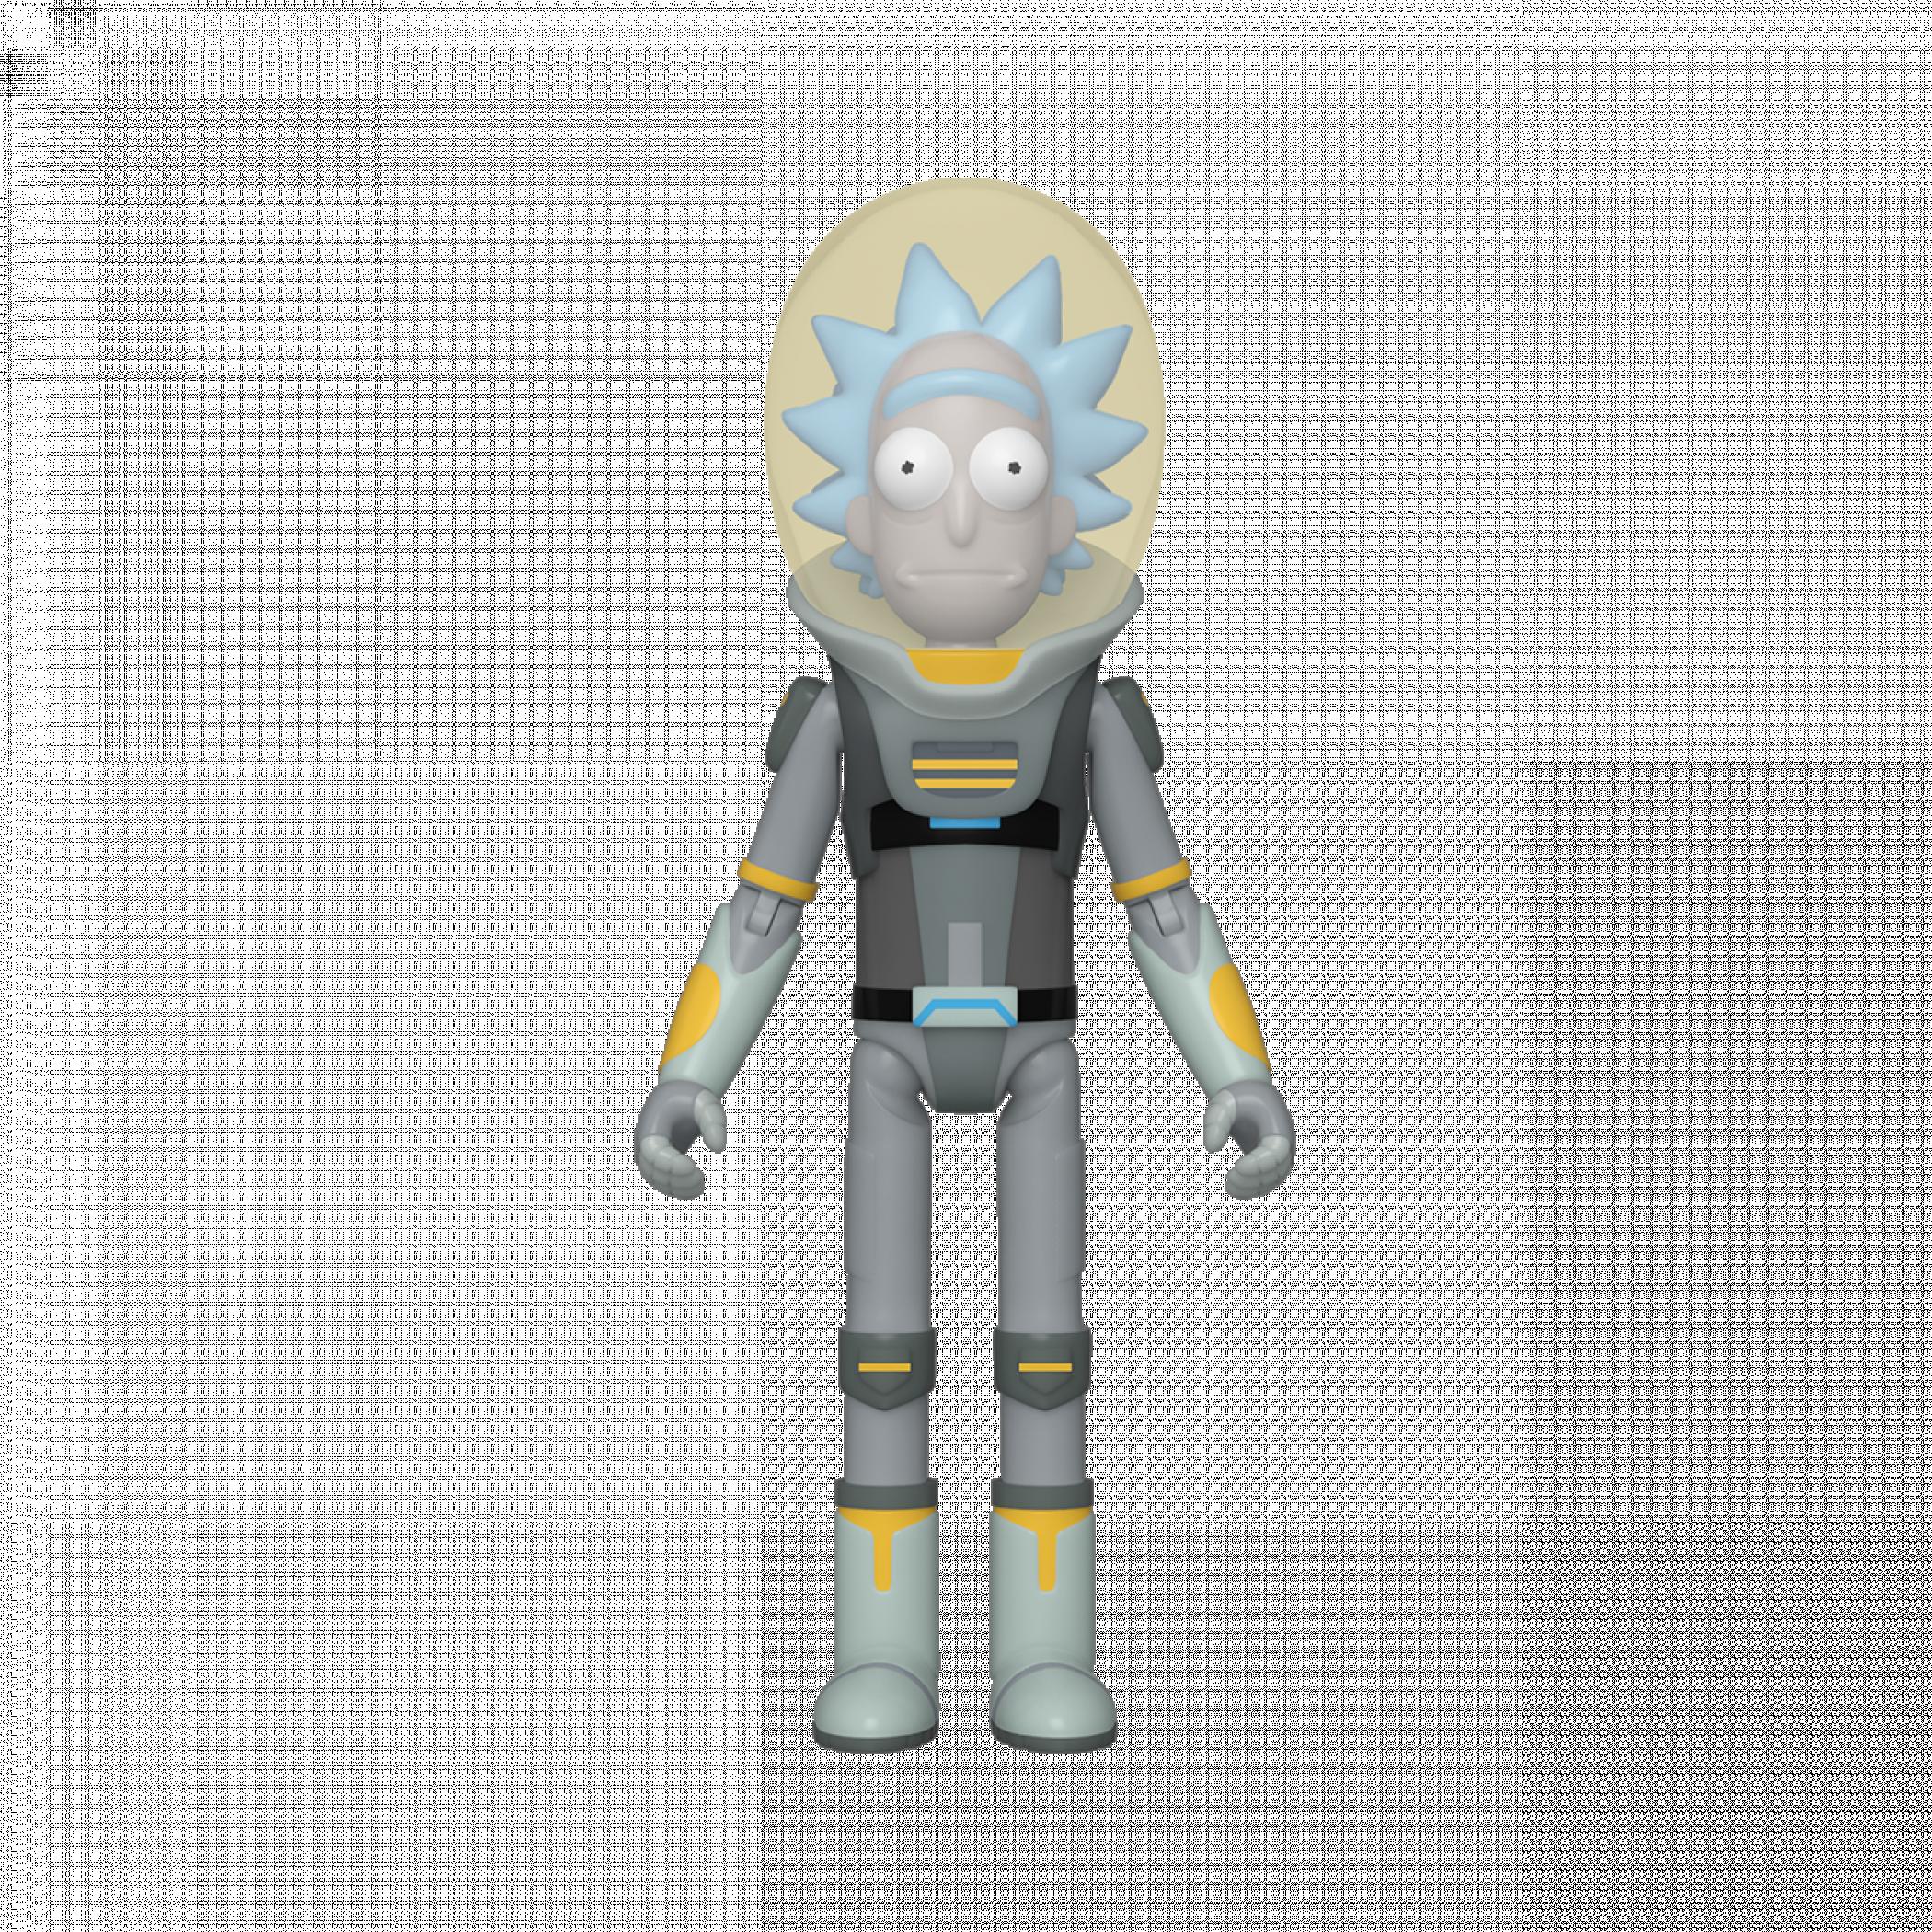 Rick & Morty Space Suit Rick Funko Action Figure